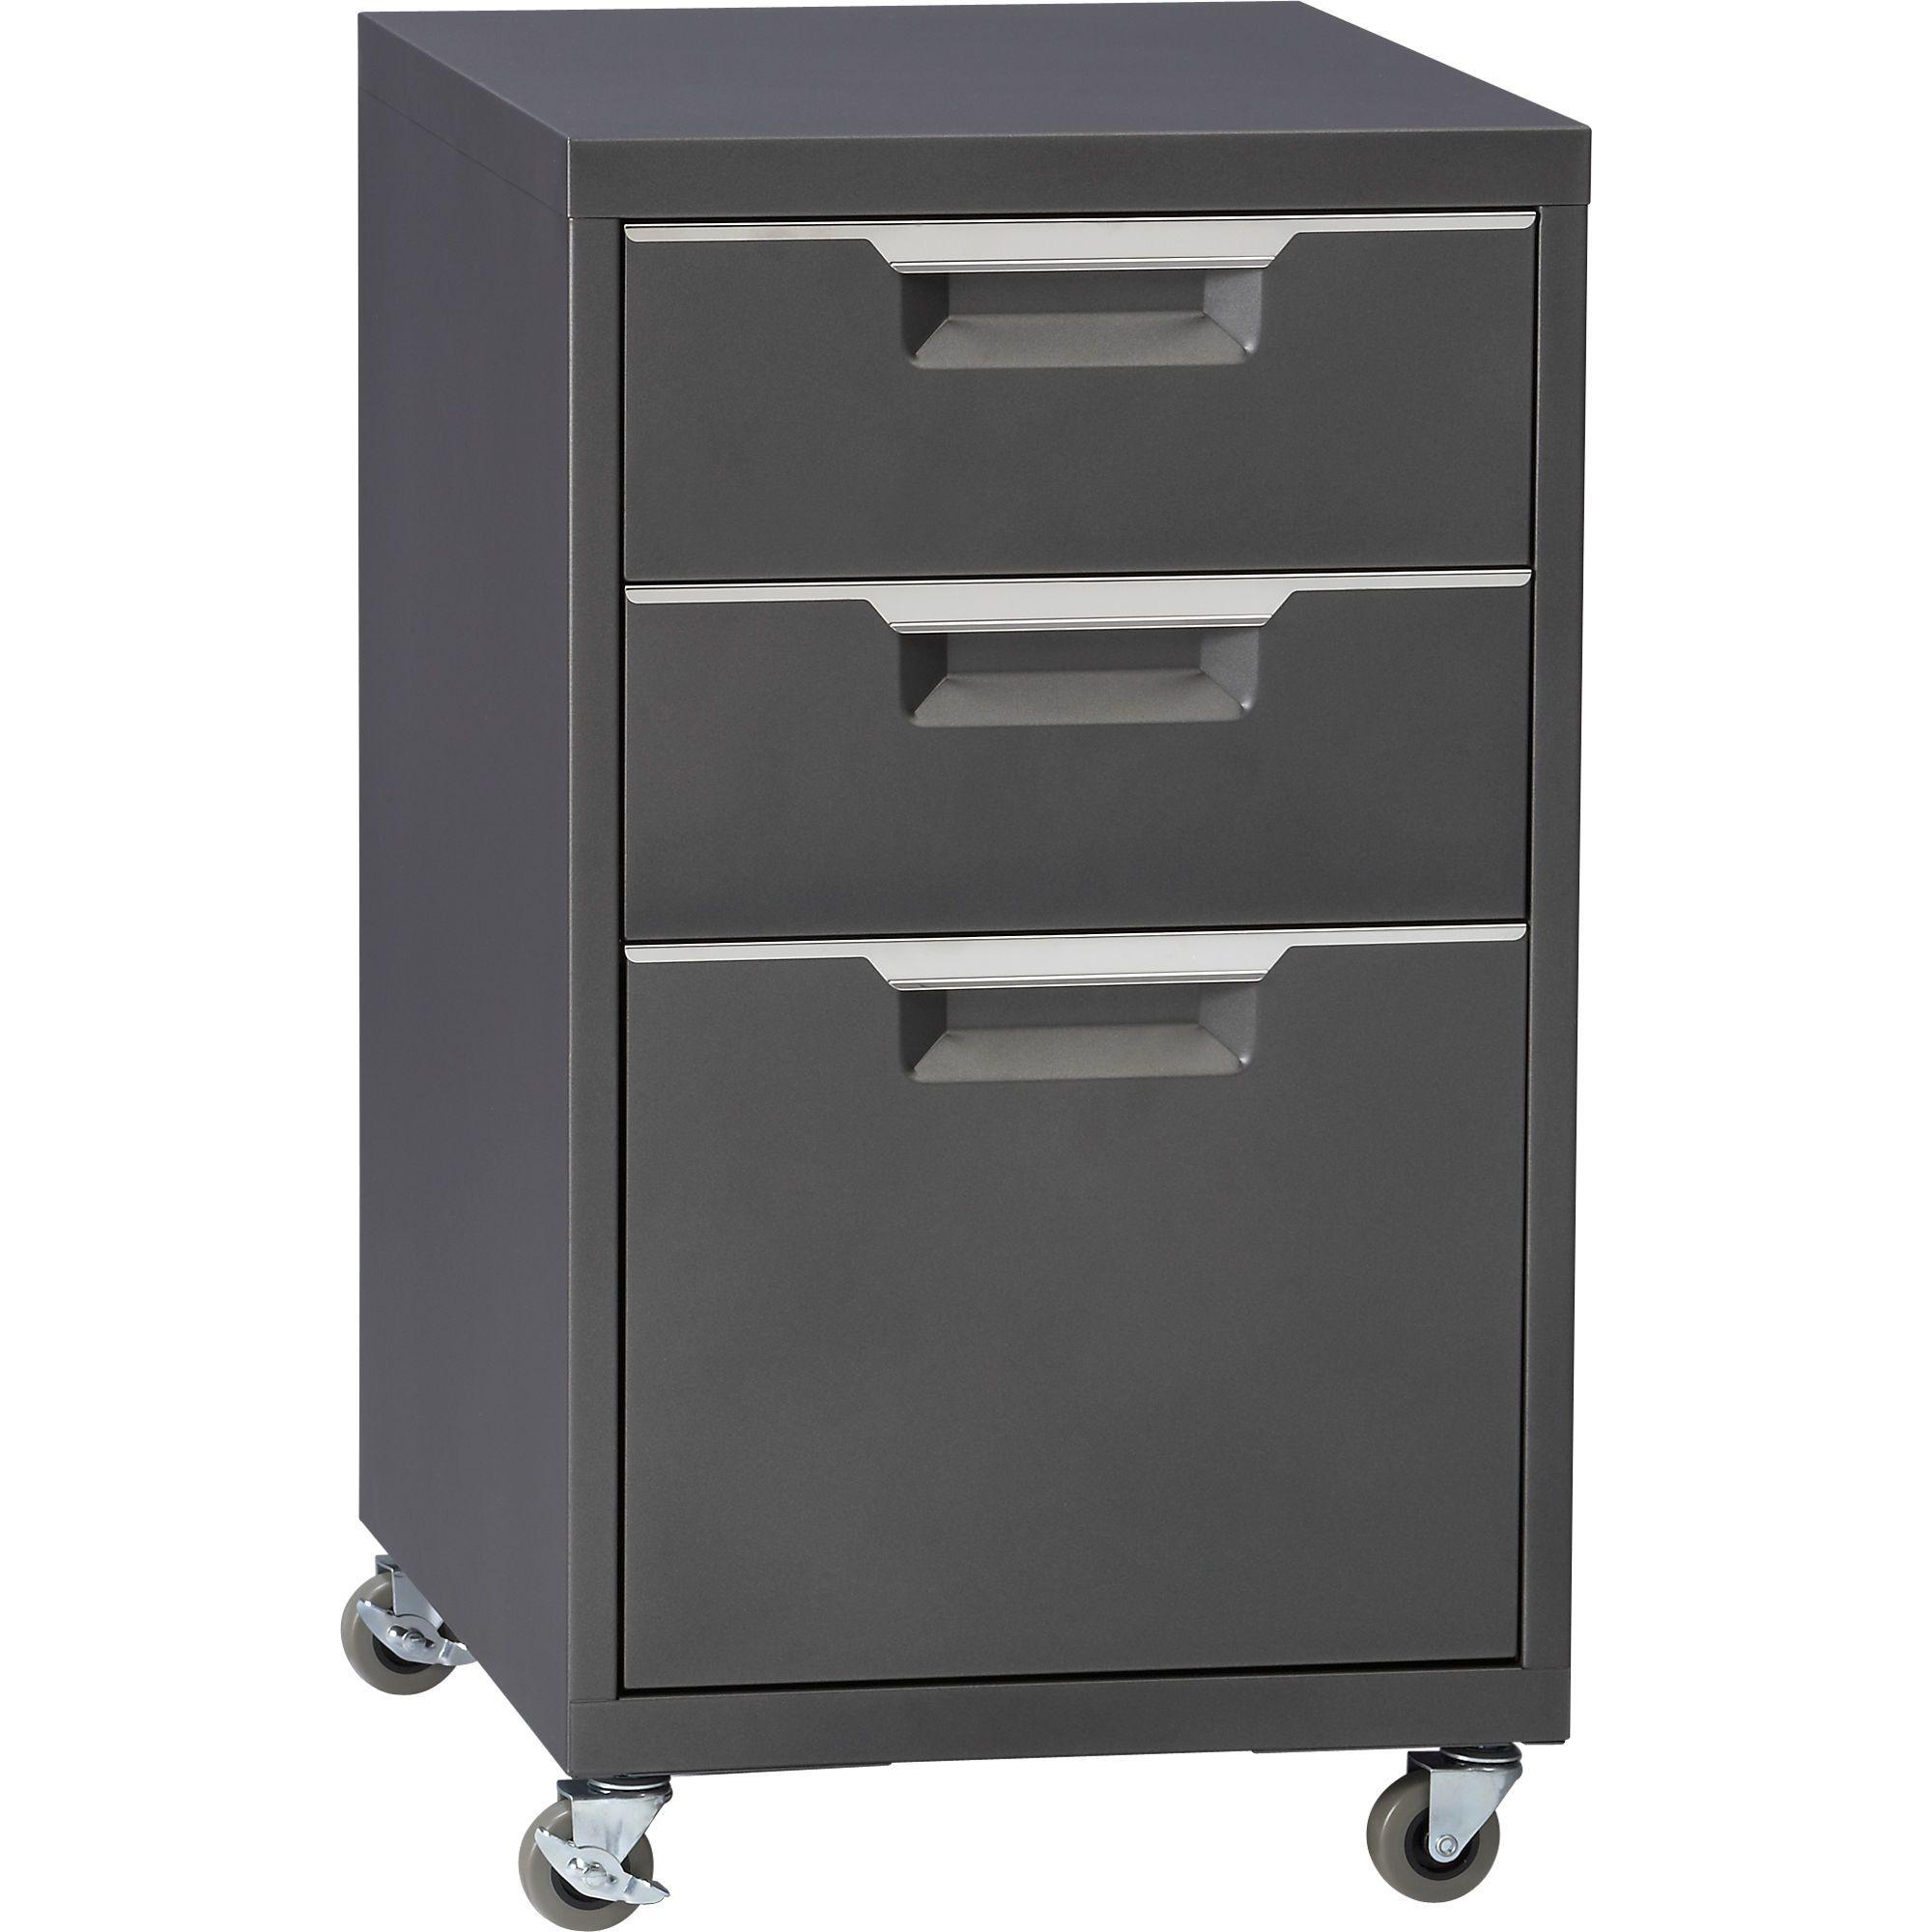 Tps Carbon 3 Drawer Filing Cabinet Filing Cabinet Drawer Filing Cabinet Modern Home Office Furniture